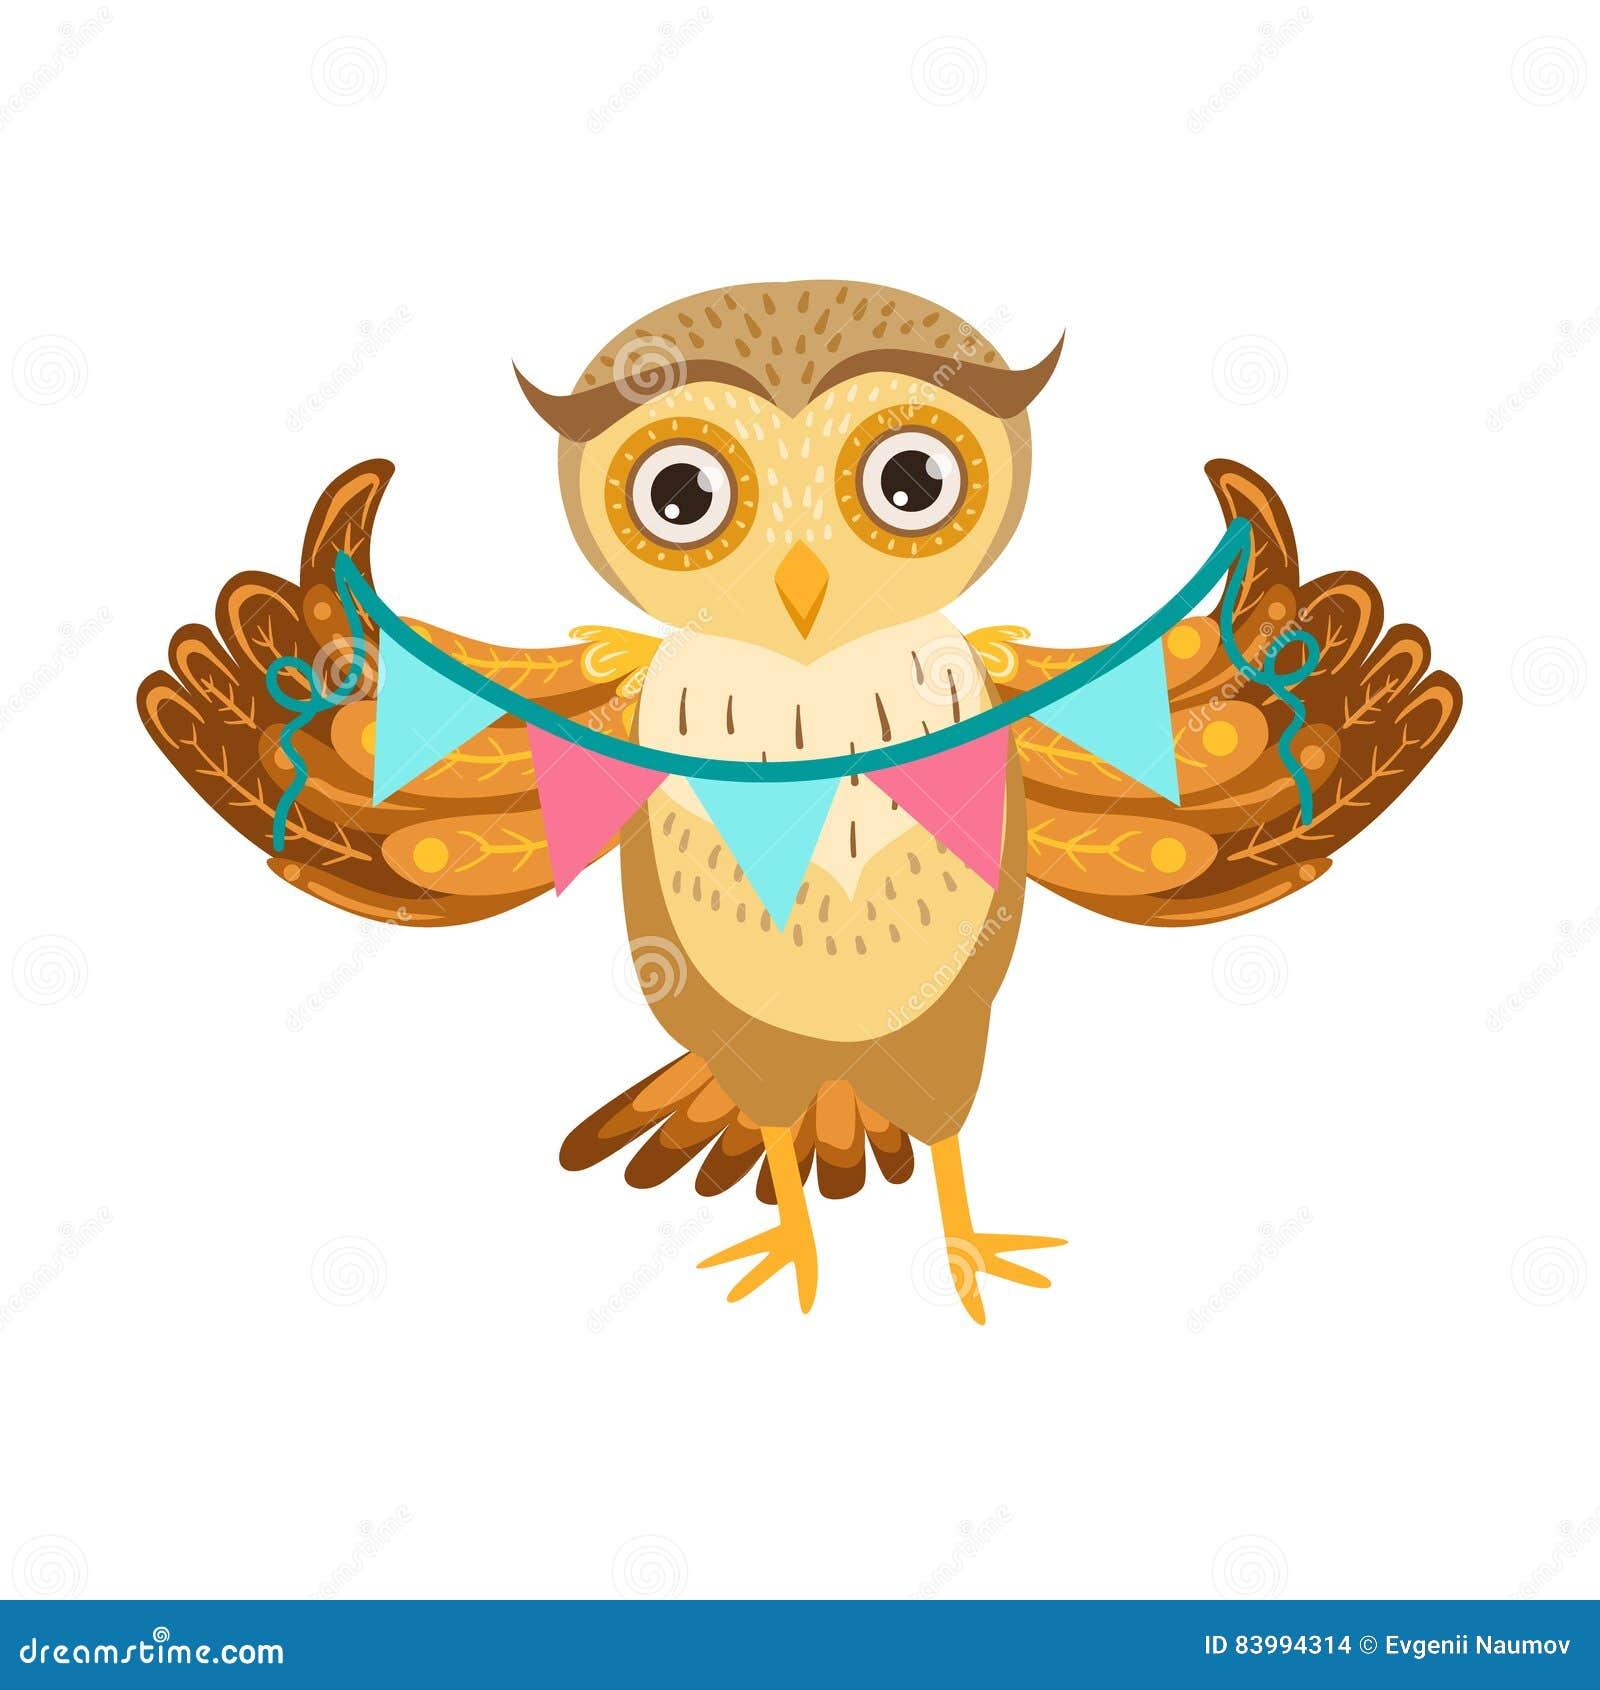 personnage de dessin anim emoji d owl holding paper garland cute avec forest bird showing human